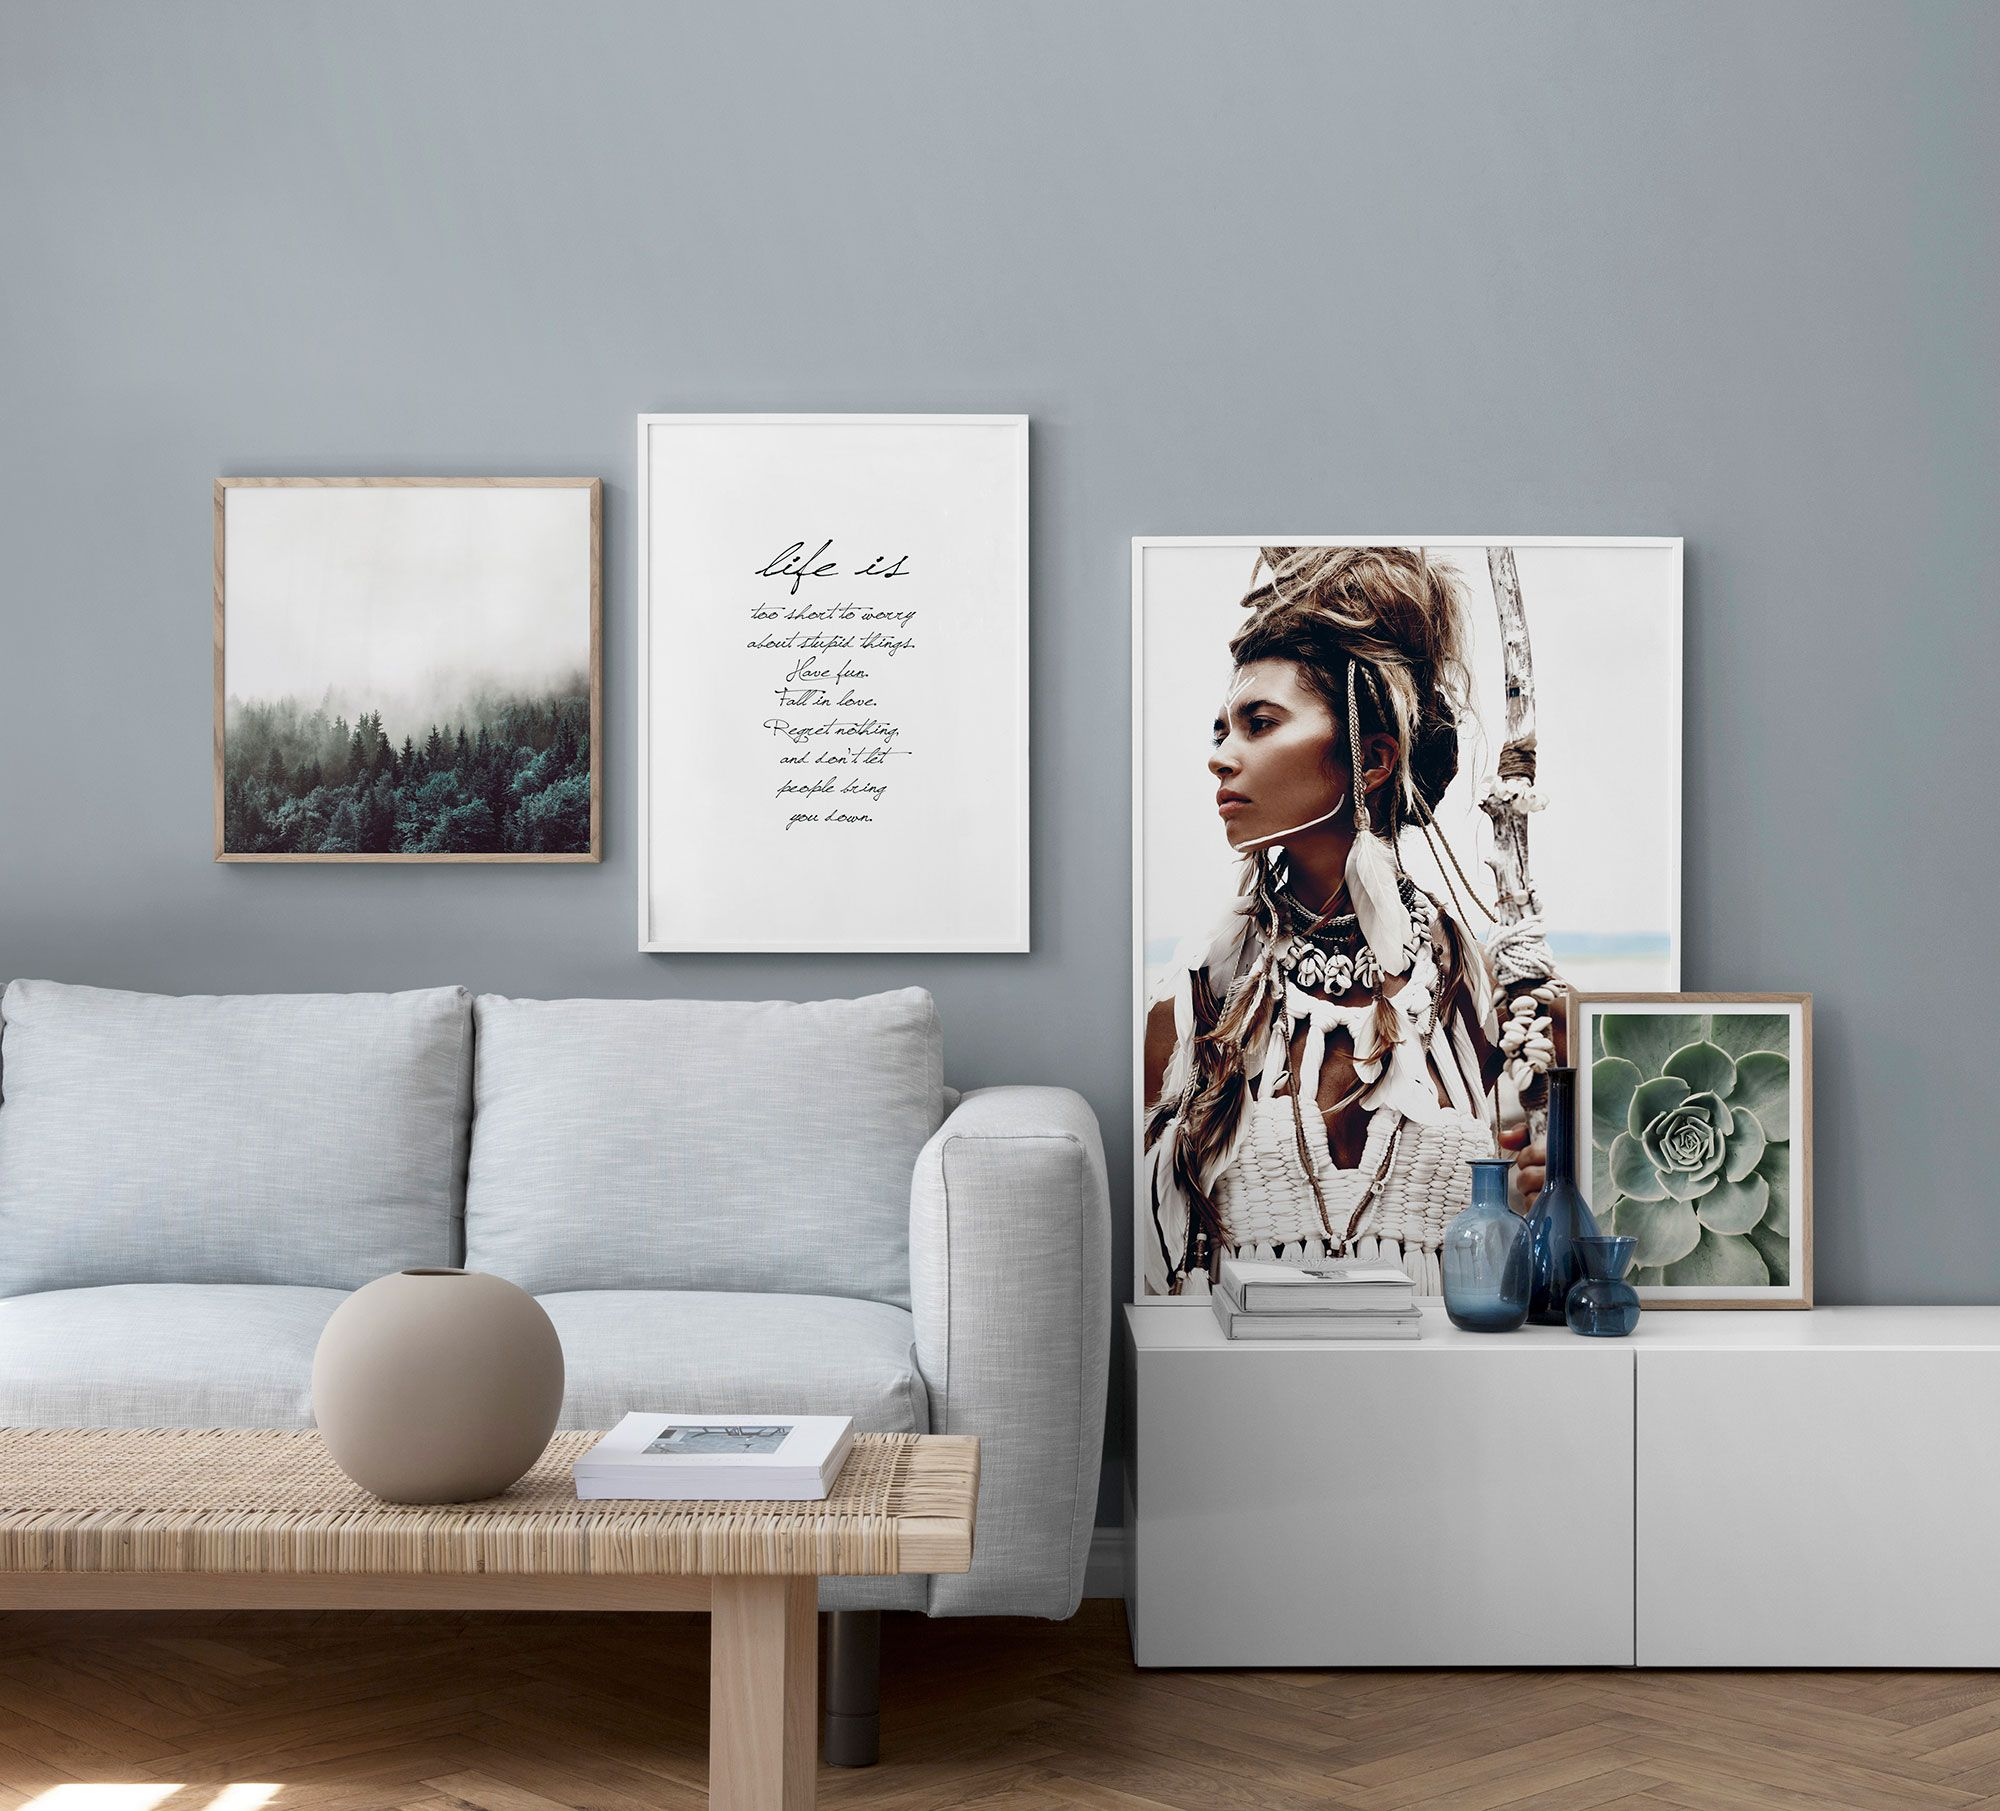 Modern urban grey living room Desenio wall gallery IKEA